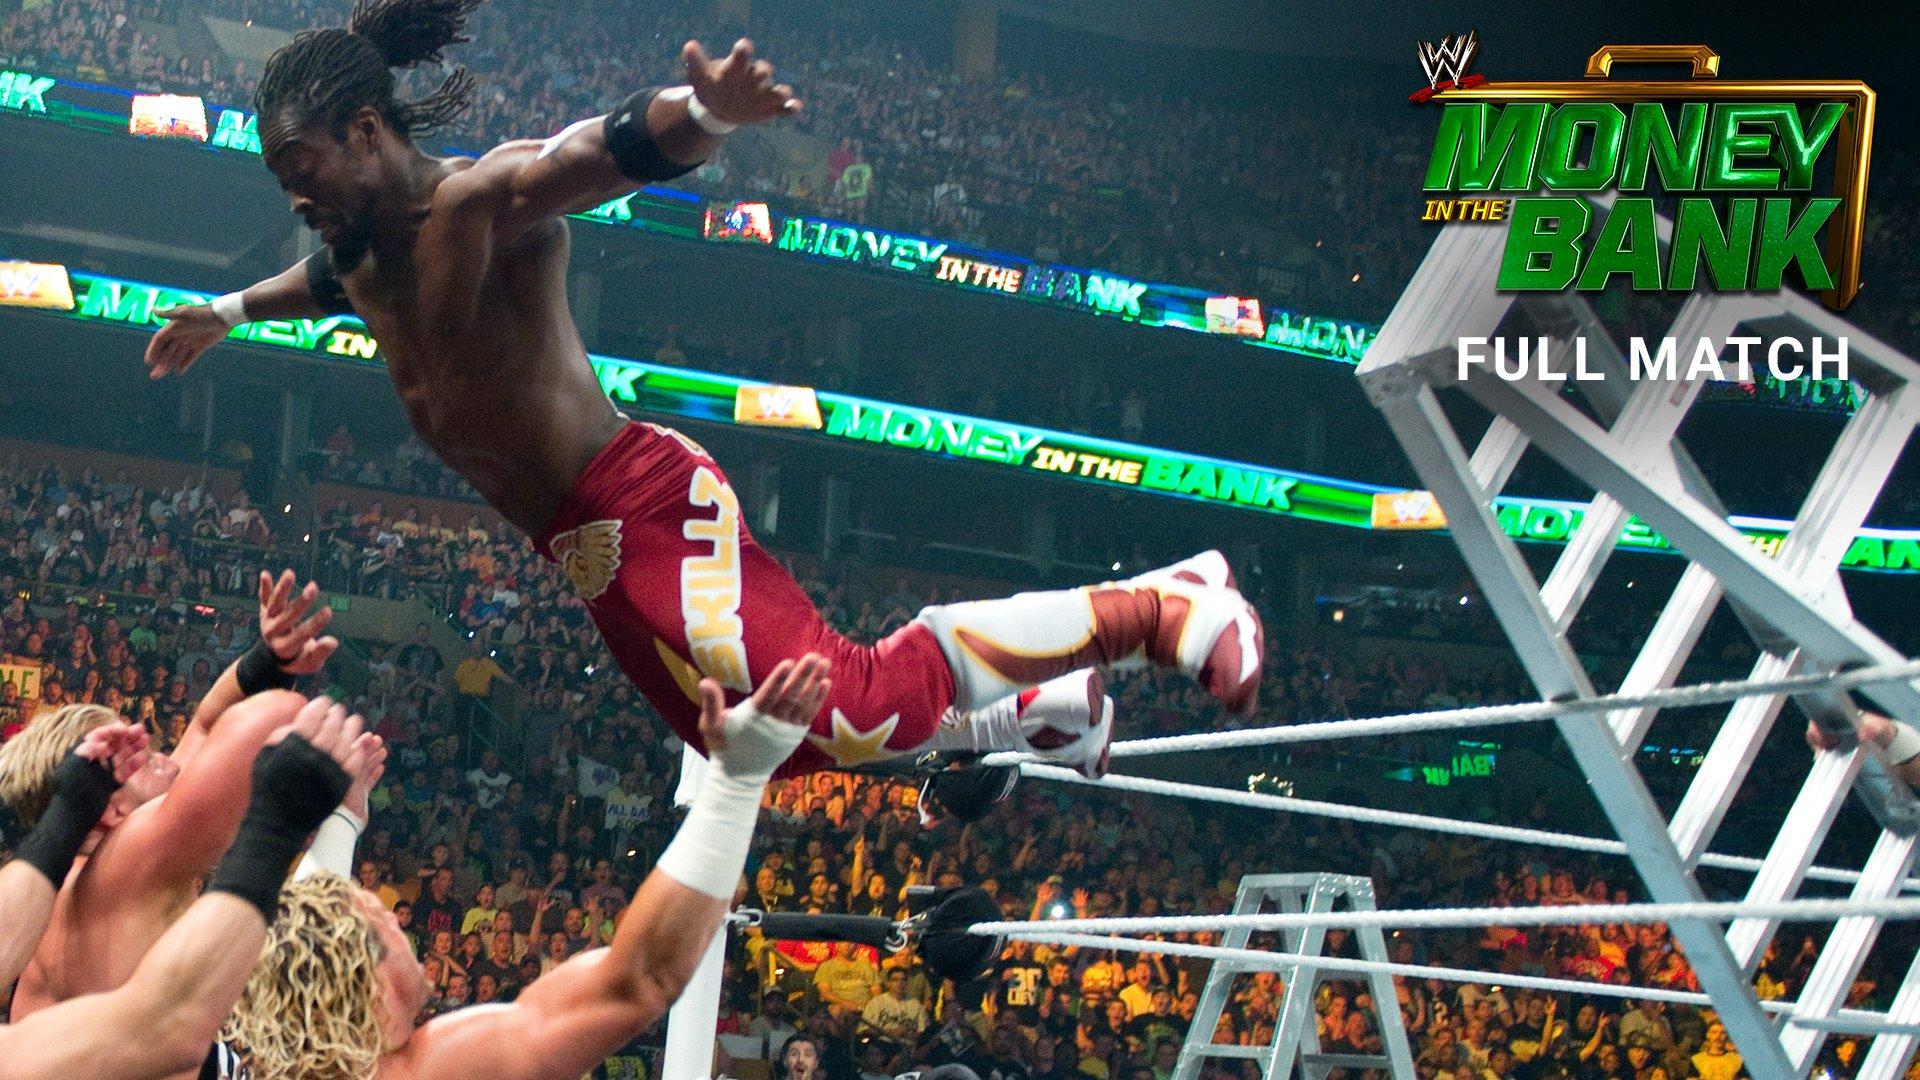 Match de l'échelle Money in the Bank pour un contrat au Titre WWE World Heavyweight: WWE Money in the Bank 2014 (Match Intégral - Exclusivité WWE Network)